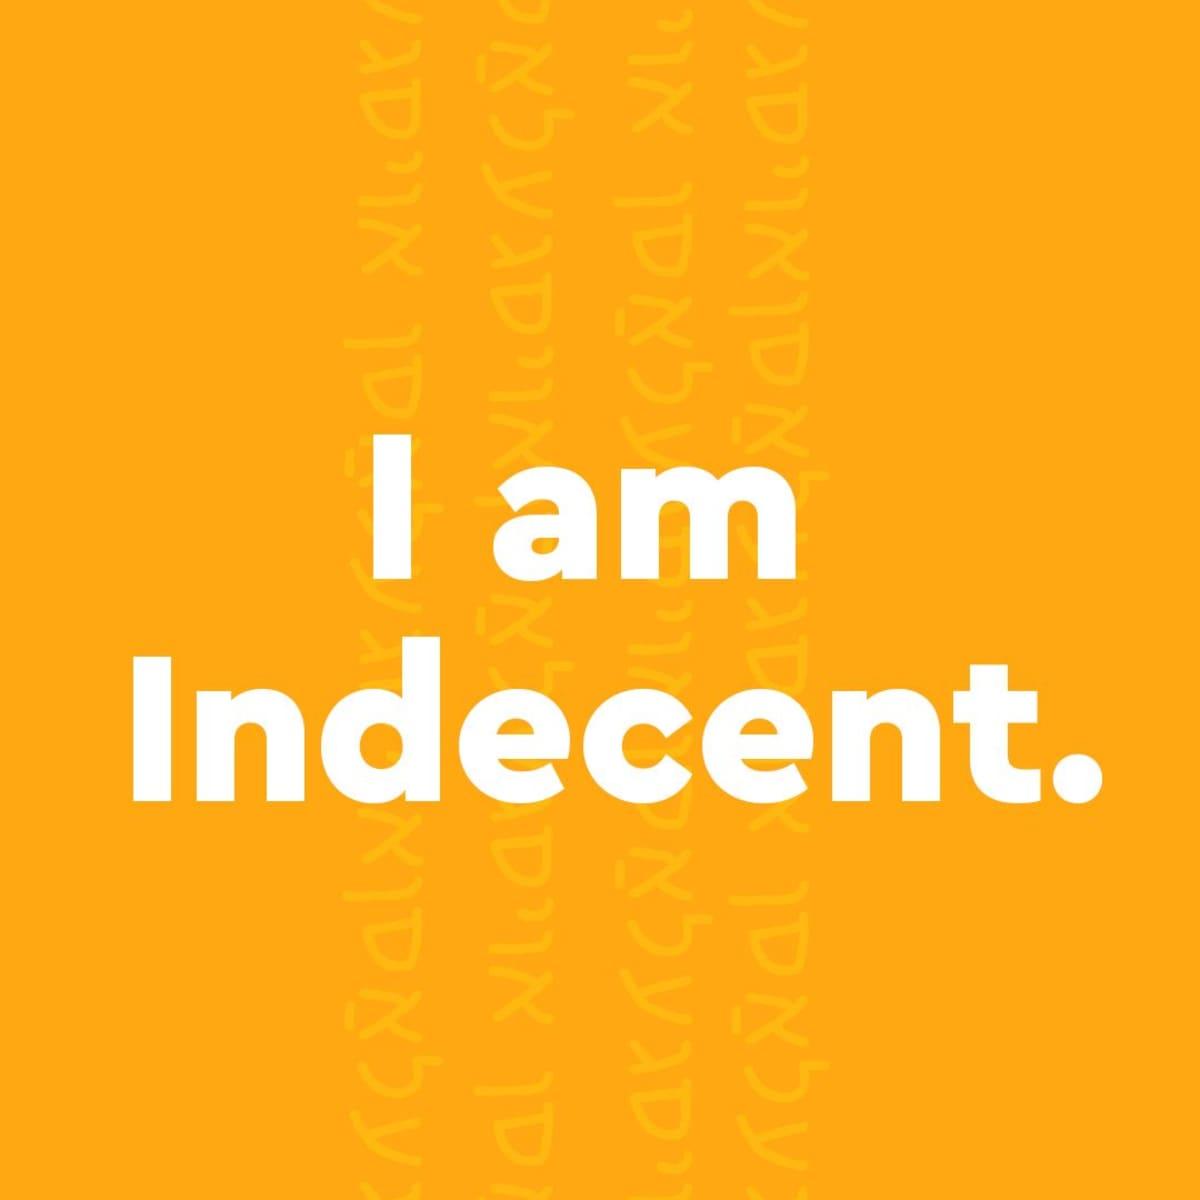 Image representing I am Indecent